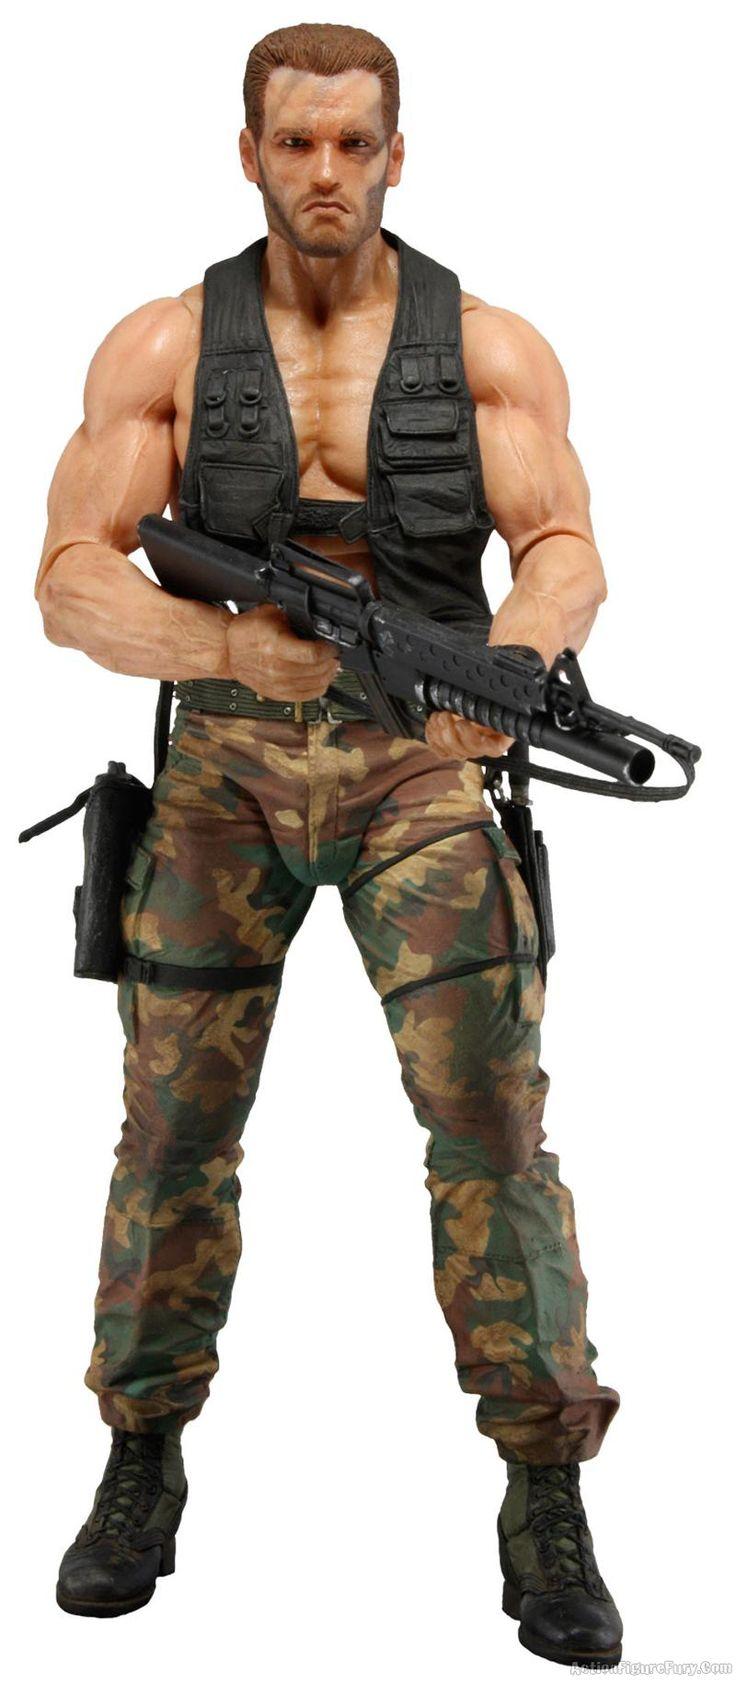 action toys | NECA Predators Series 9 Action Figures | Action Figure Fury